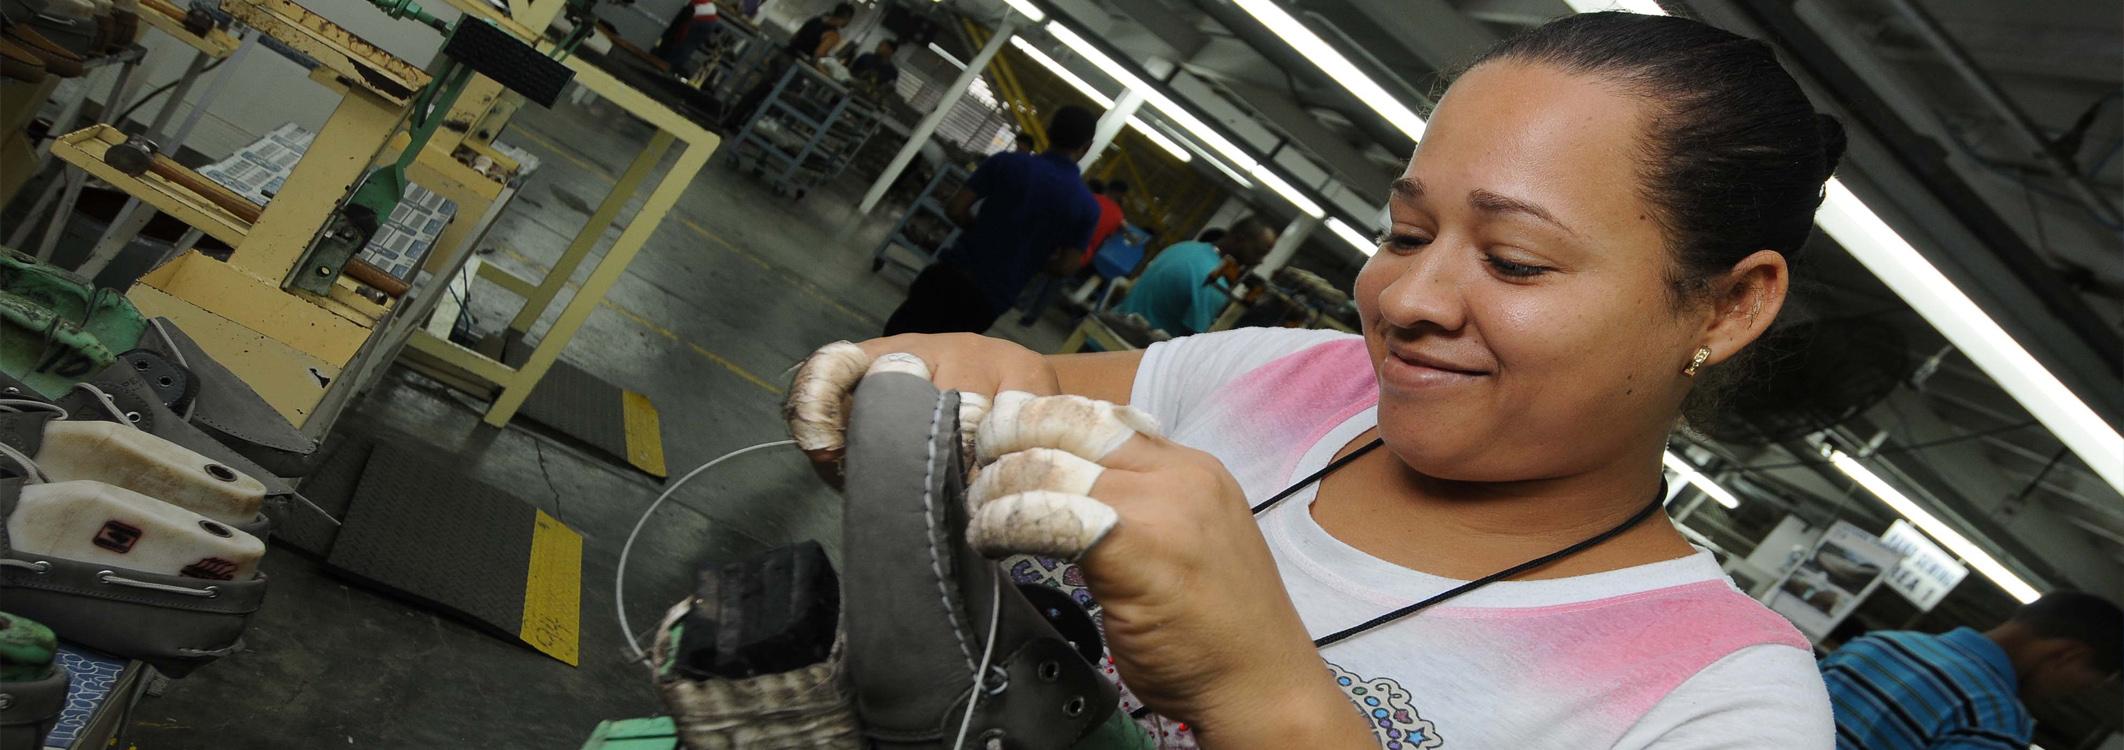 Reparación de Zapatos